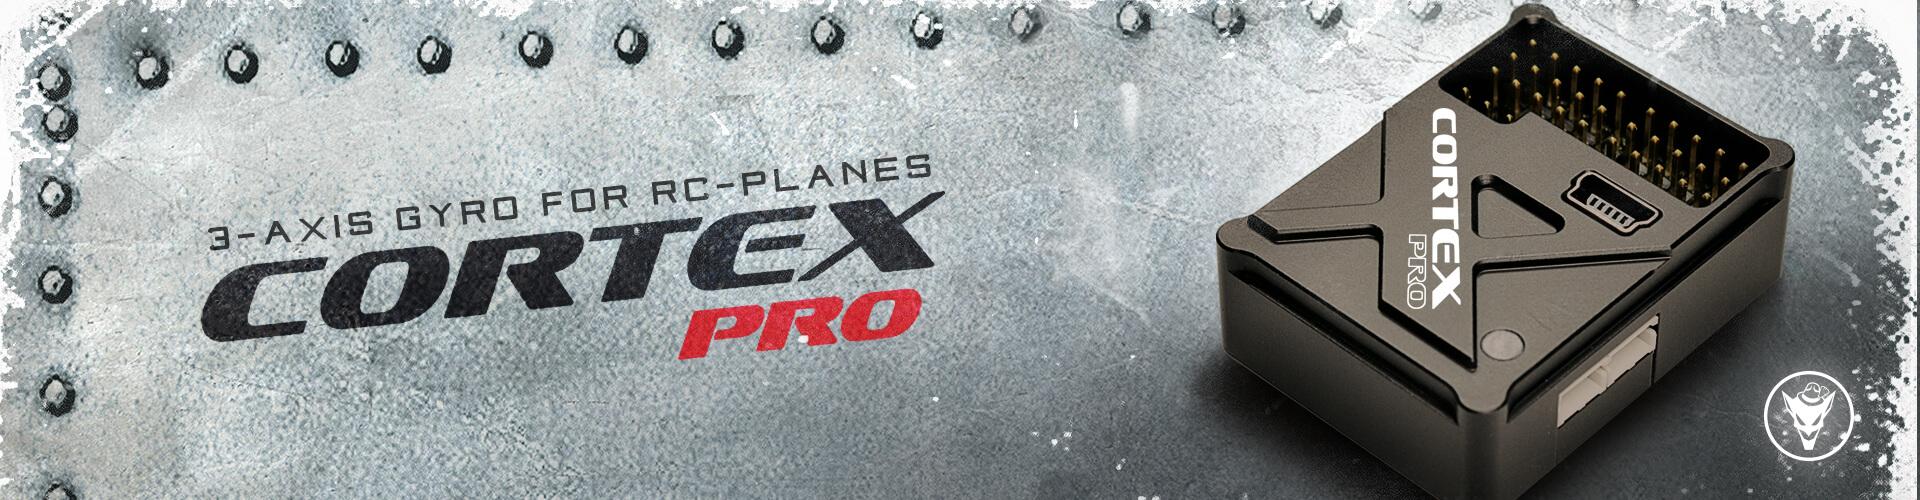 CORTEX Pro fixed-wing aircraft gyro - Bavarian Demon